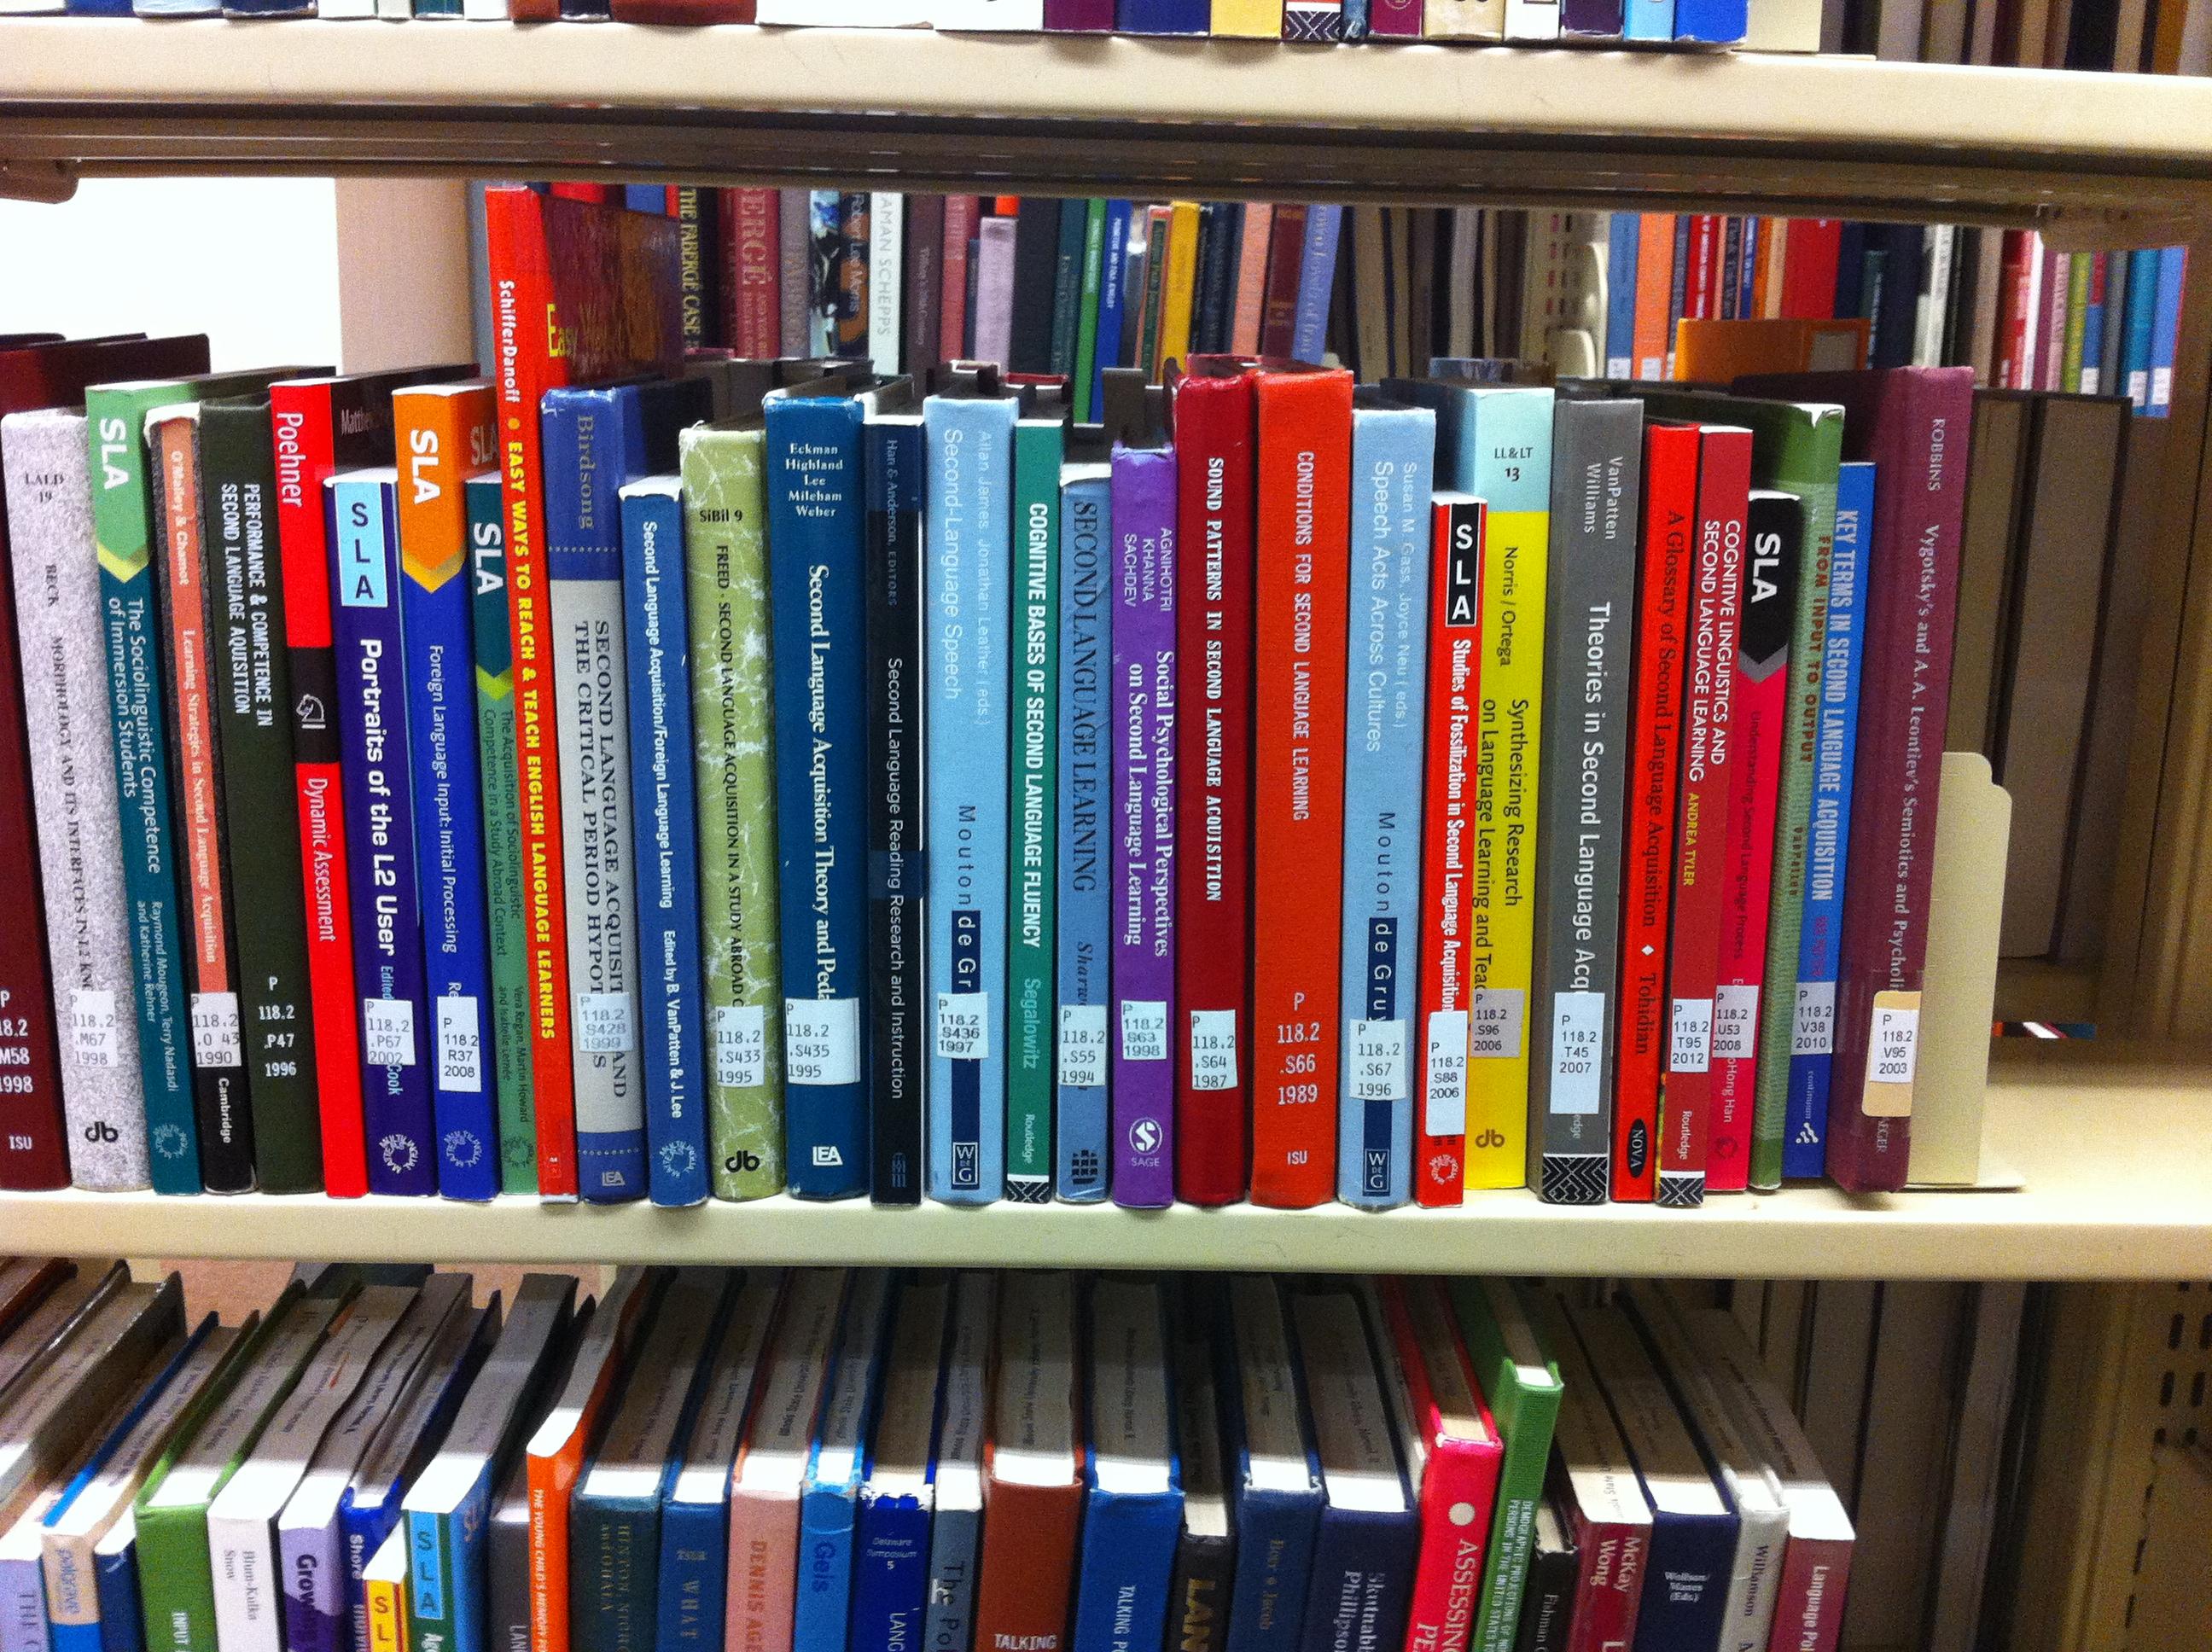 Second_Language_Acquisition_Books.JPG